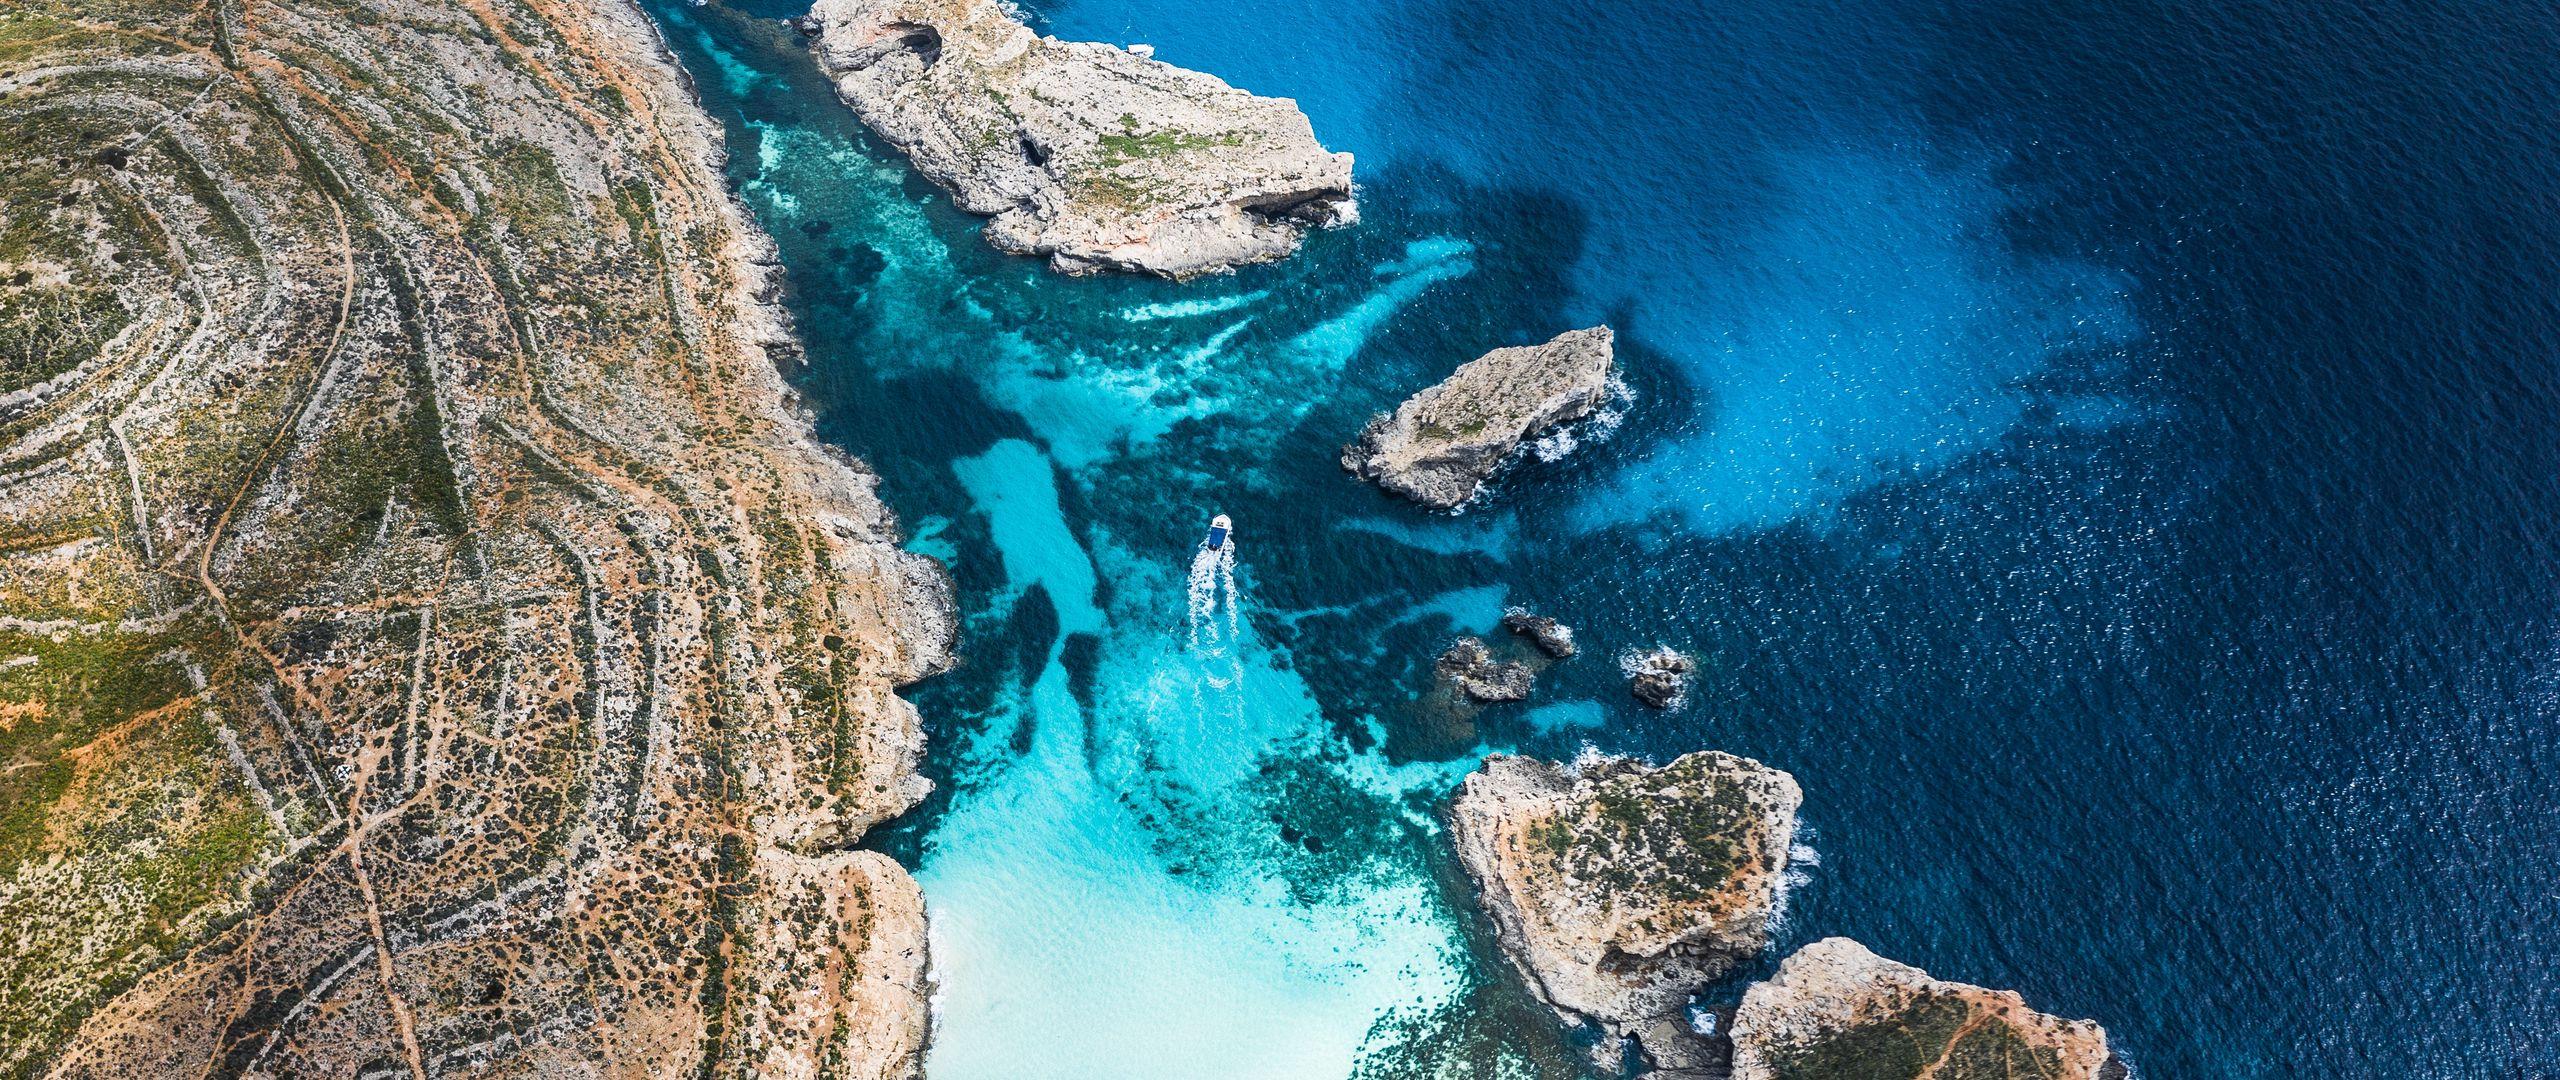 Download wallpaper 2560x1080 bay coast stony ocean island 2560x1080